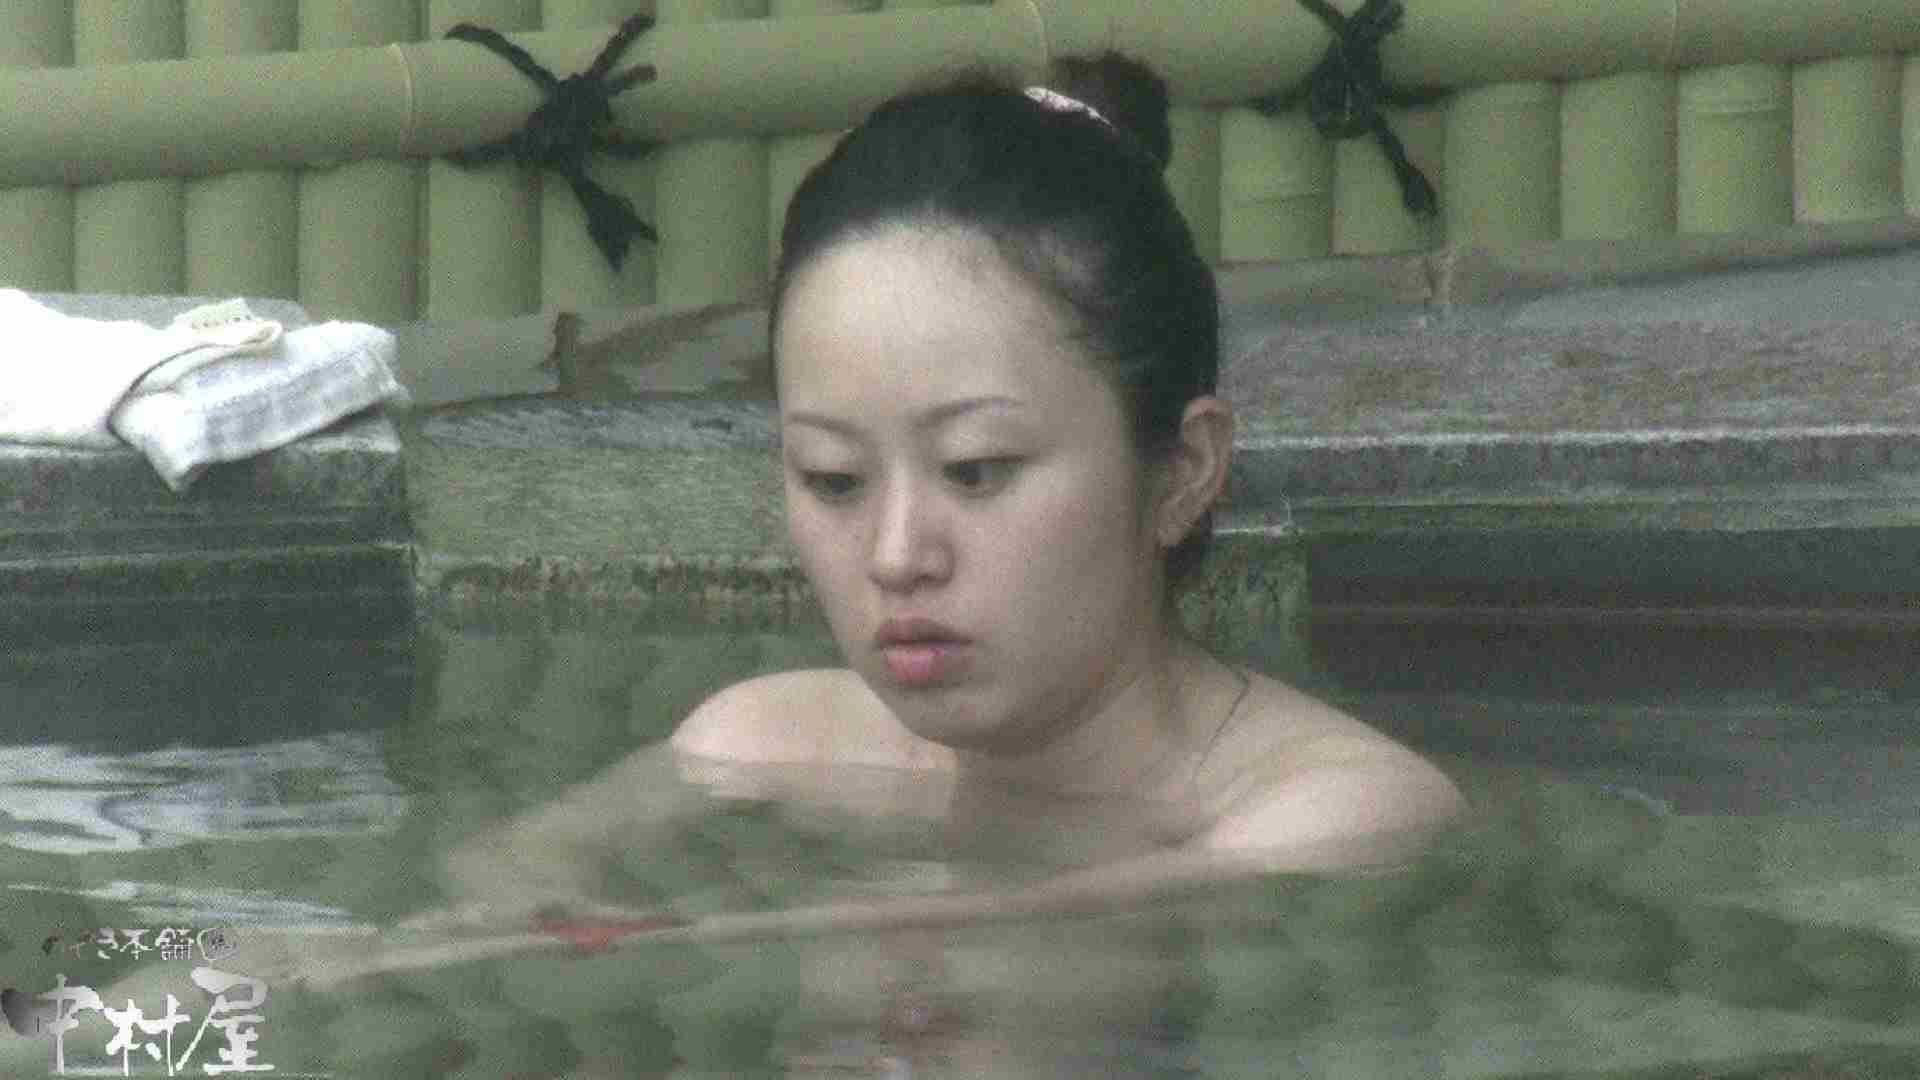 Aquaな露天風呂Vol.912 OLセックス   盗撮  62画像 37